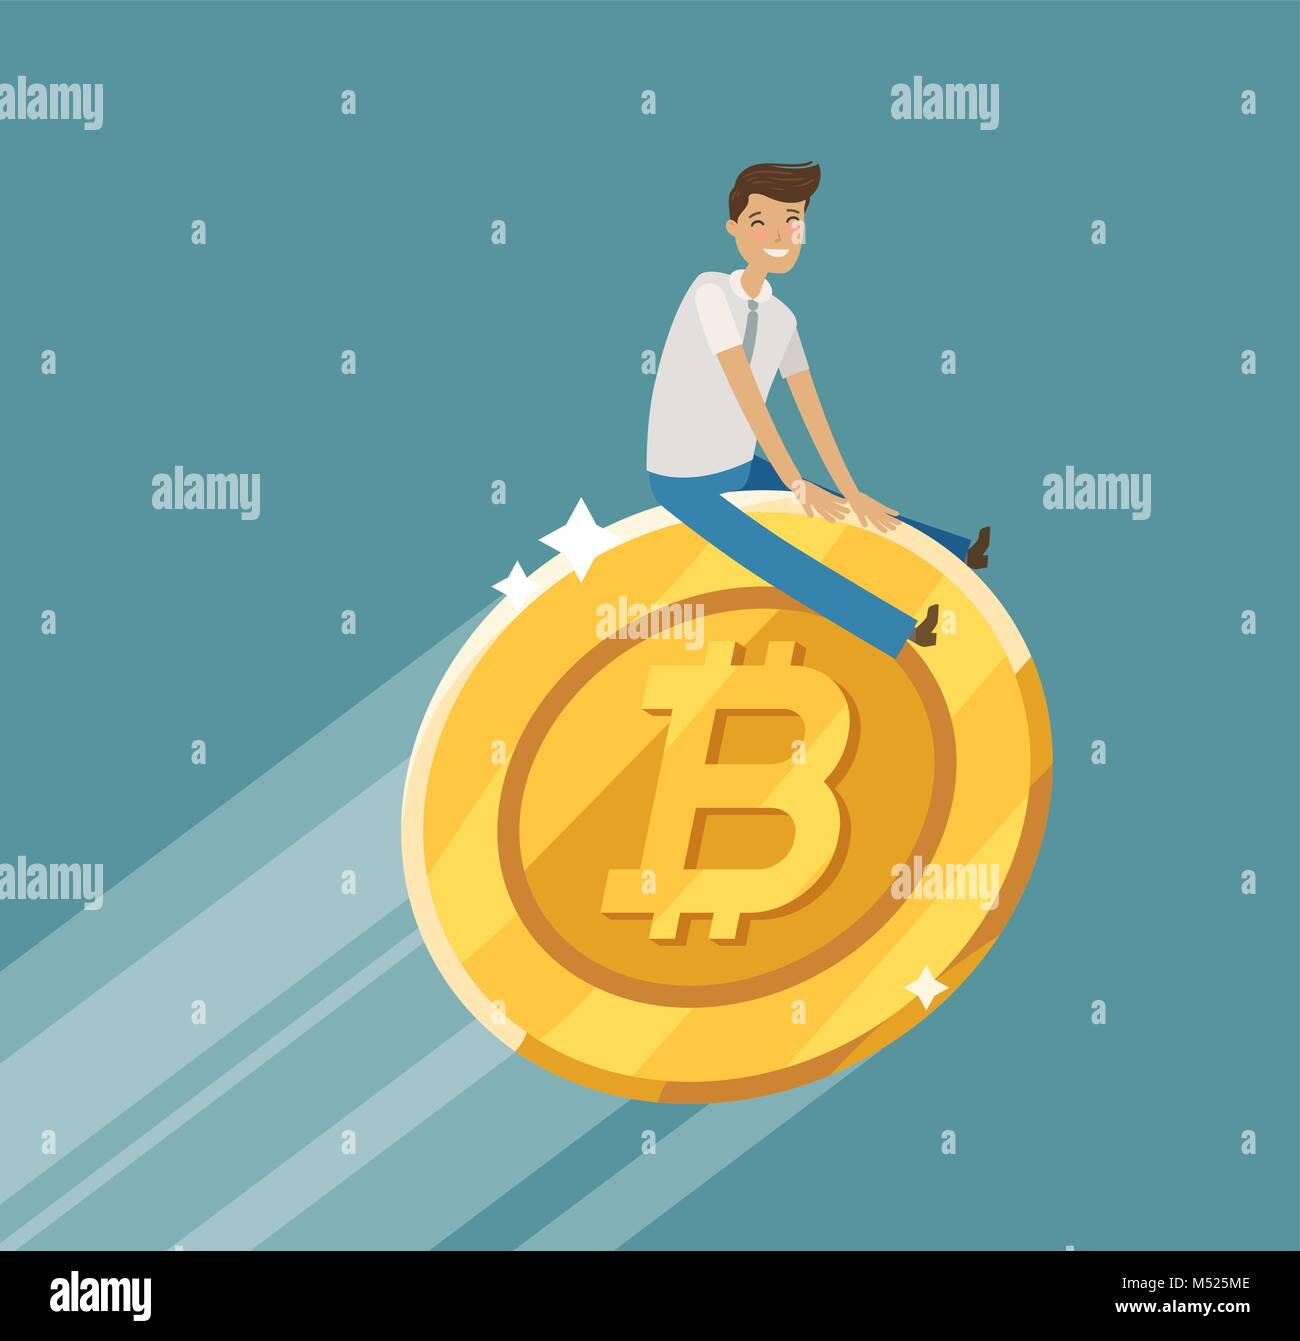 Concept d'entreprise. Monnaie blockchain crypto Bitcoin. Cartoon vector illustration Photo Stock